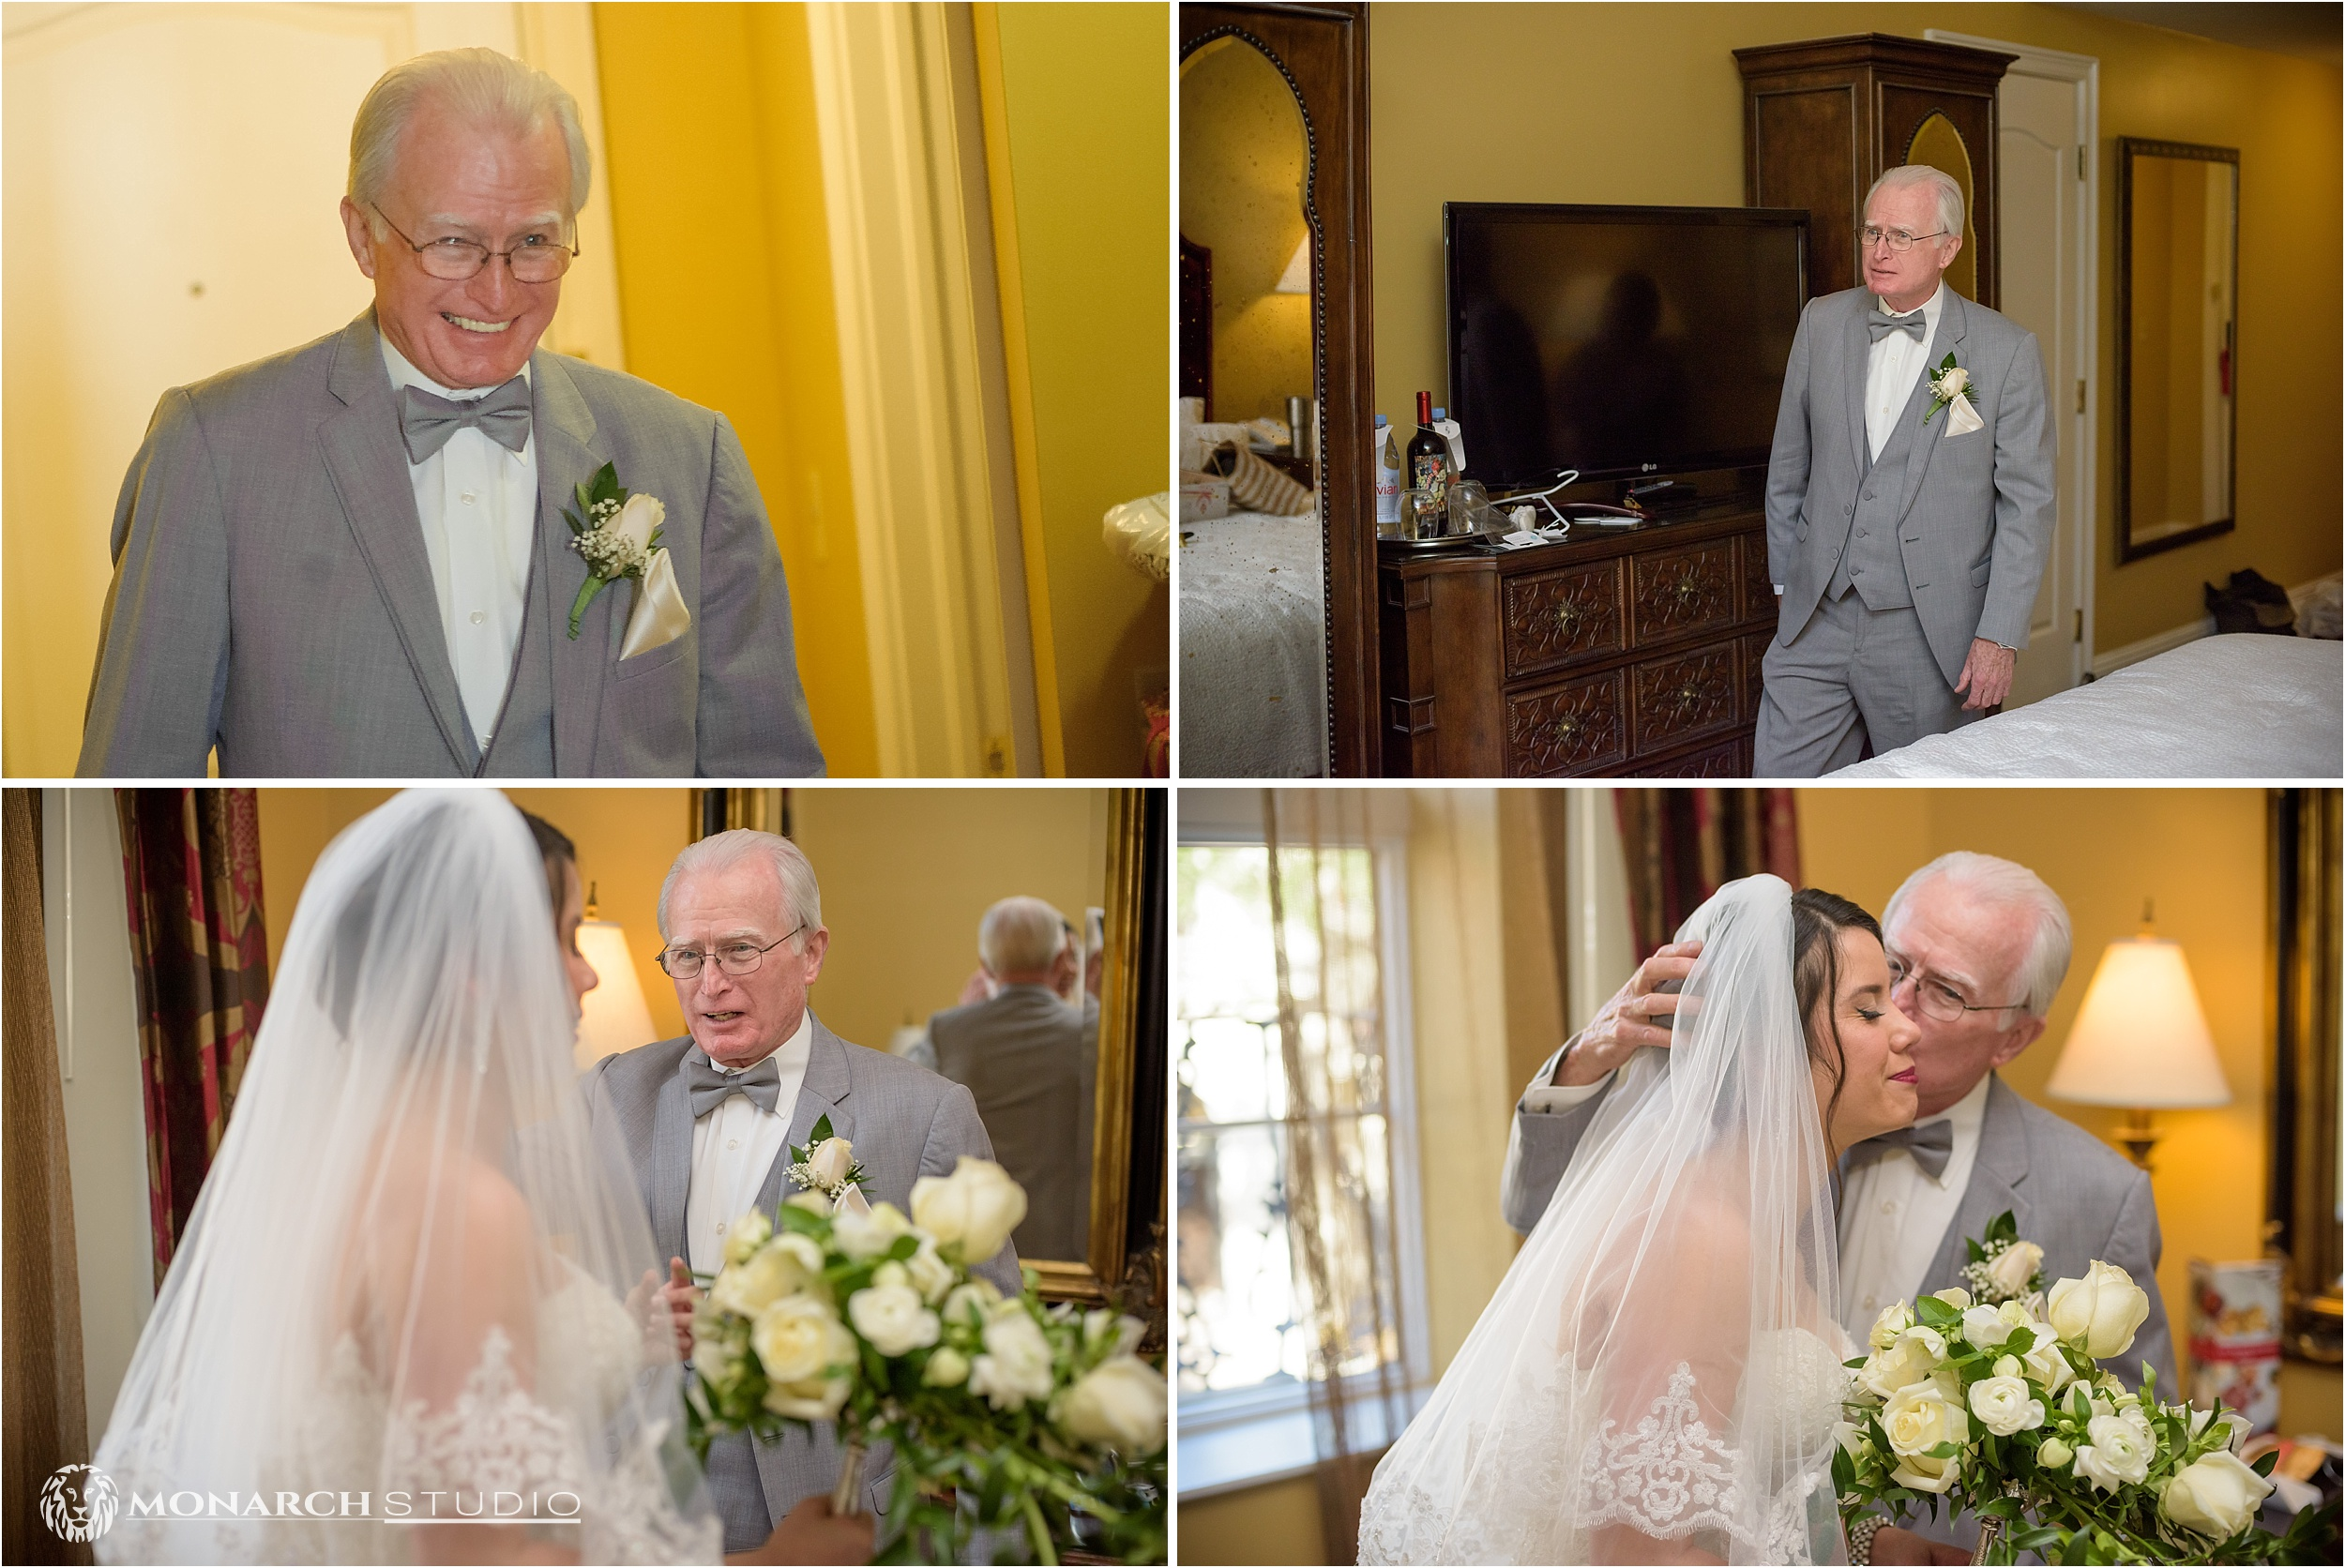 wedding-photographer-in-st-augustine-florida-treasury-015.jpg